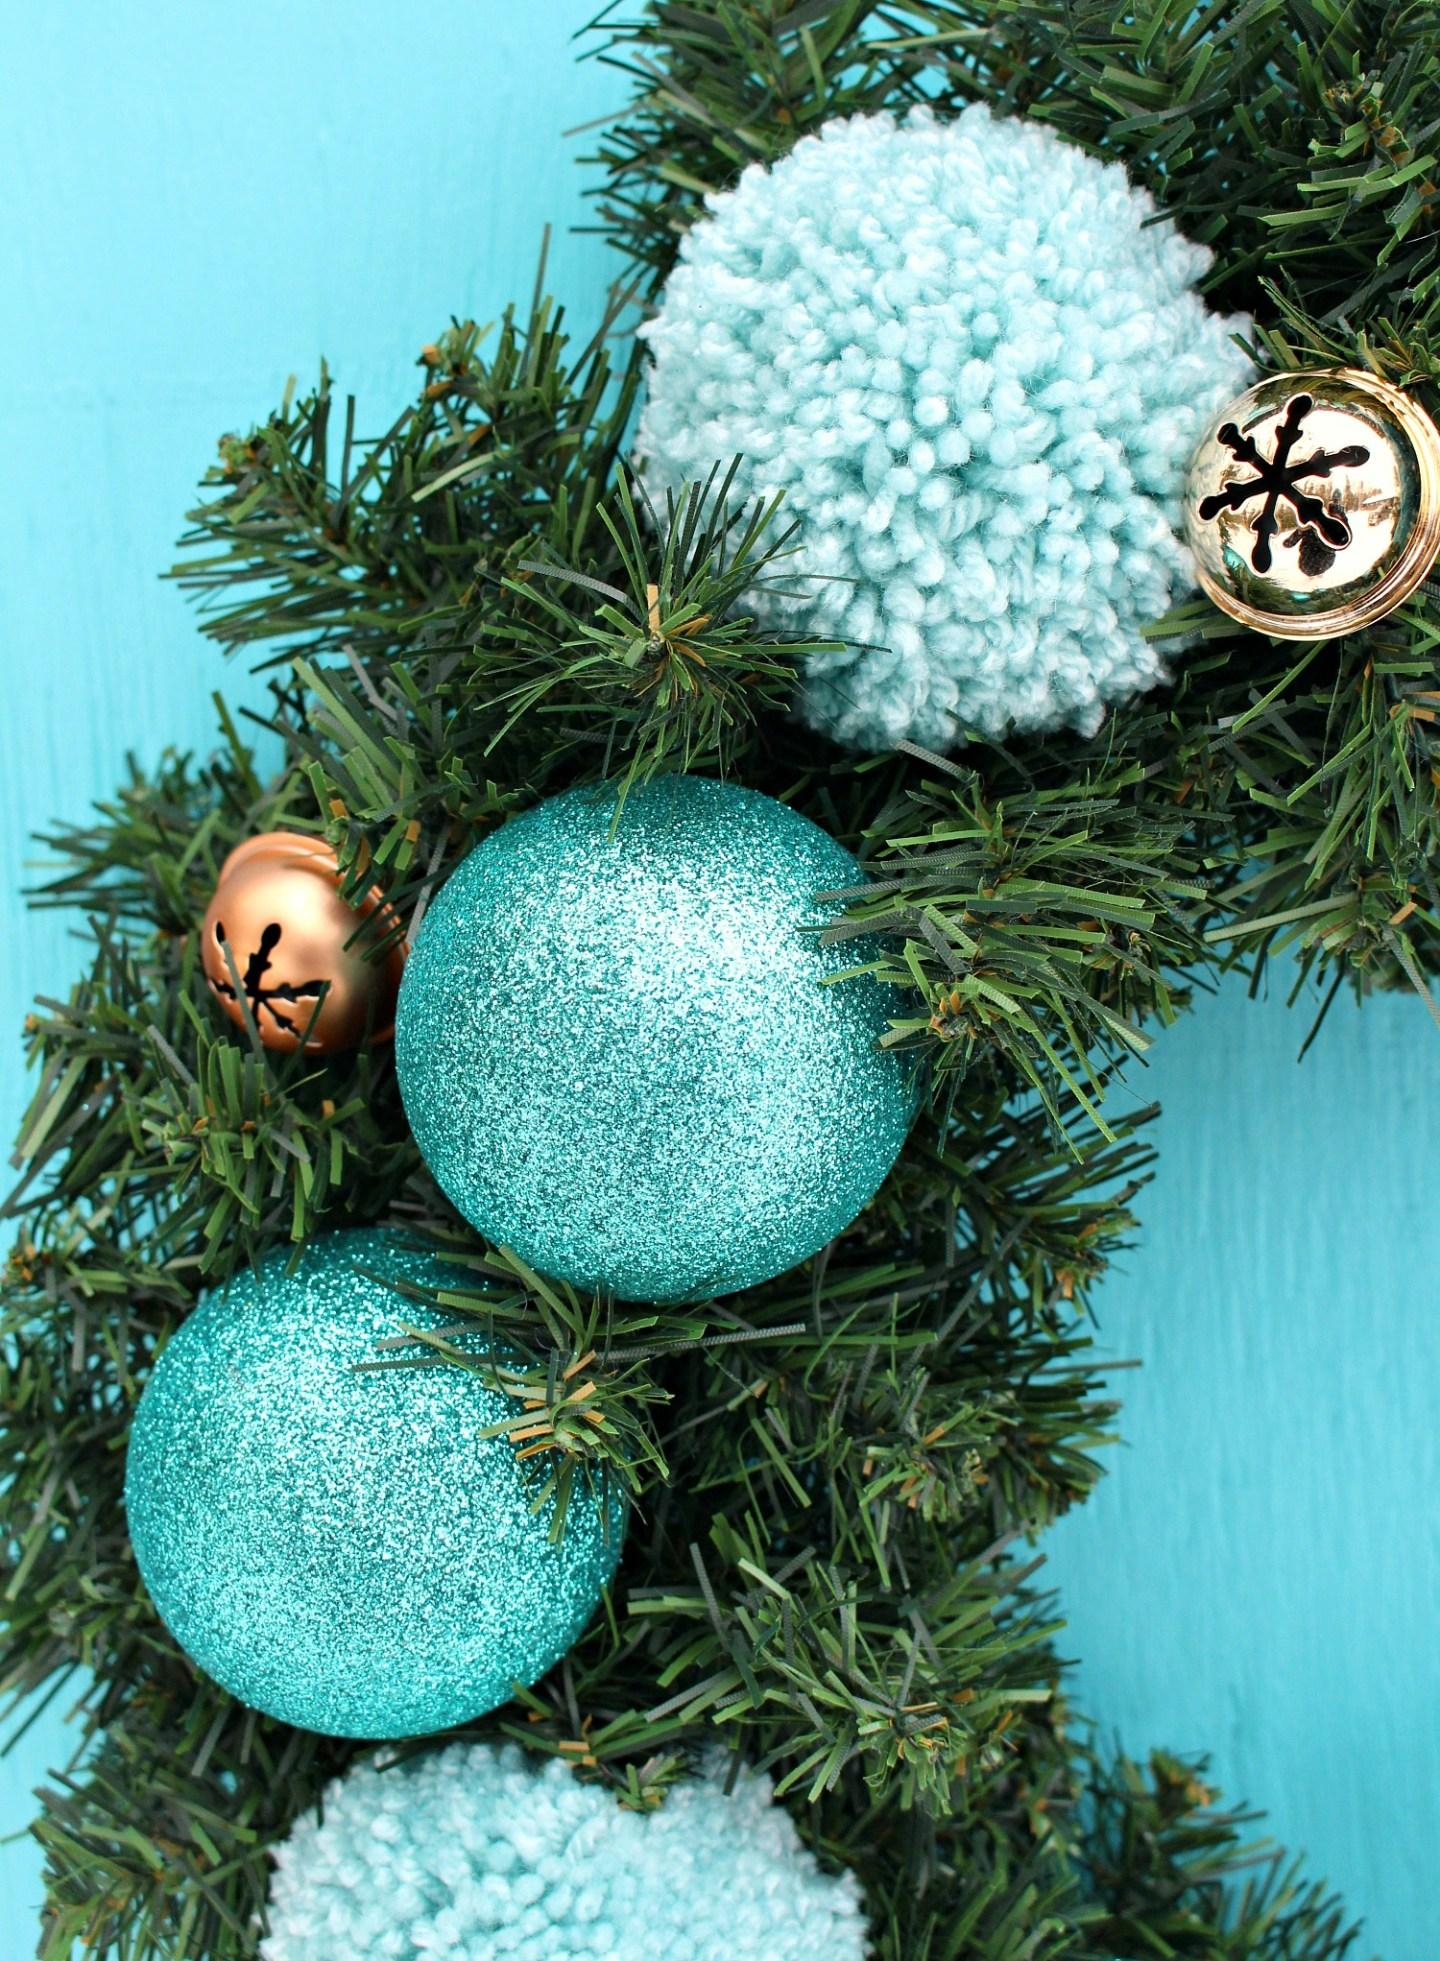 Turquoise Wreath DIY Idea